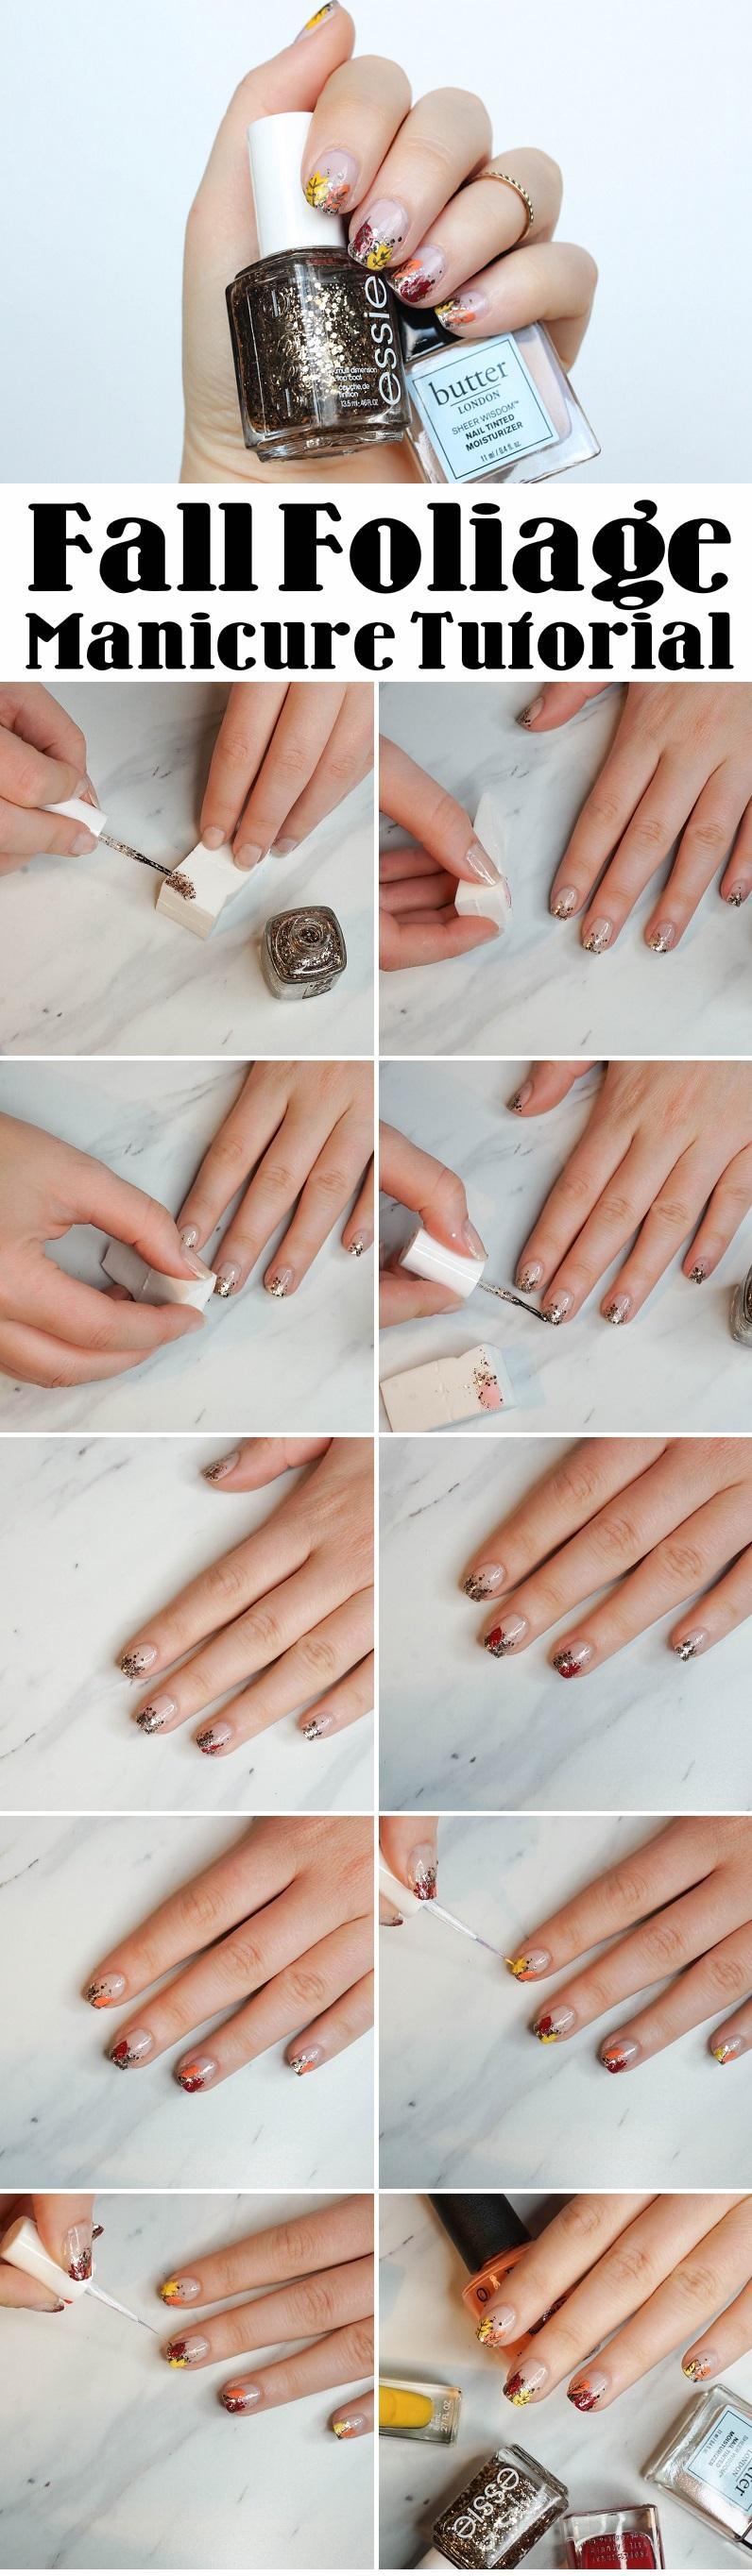 Step by Step Fall Foliage Manicure Tutorial Glitter Nail Art Jackie Giardina Living After Midnite